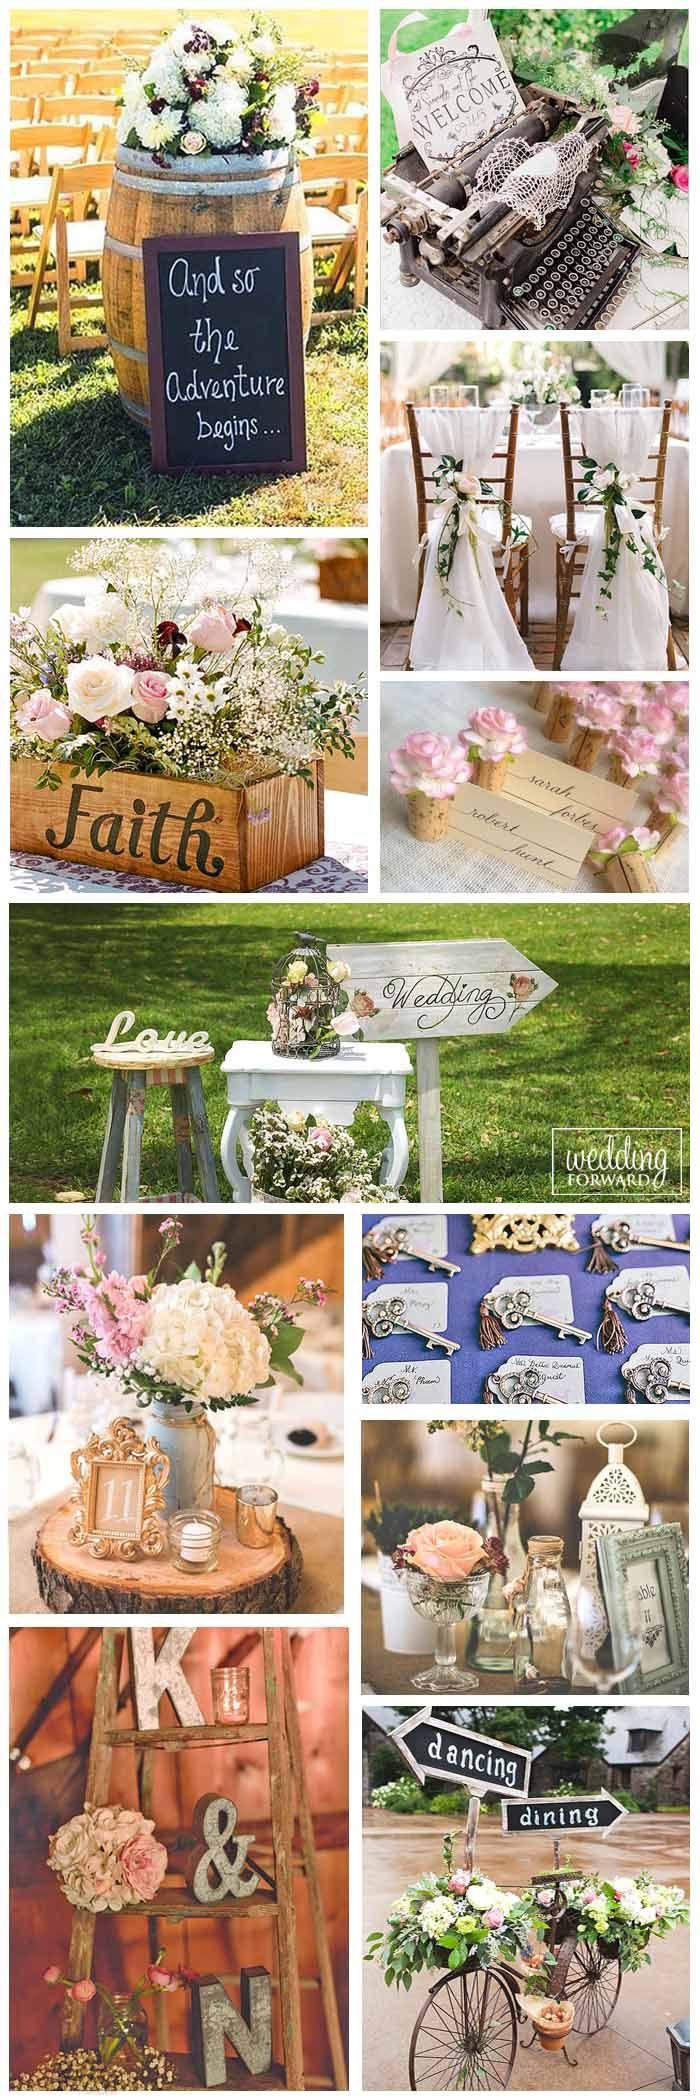 Shabby & Chic Vintage Wedding Decor Ideas | Shabby chic wedding decor, Shabby  chic birthday, Vintage wedding centerpieces